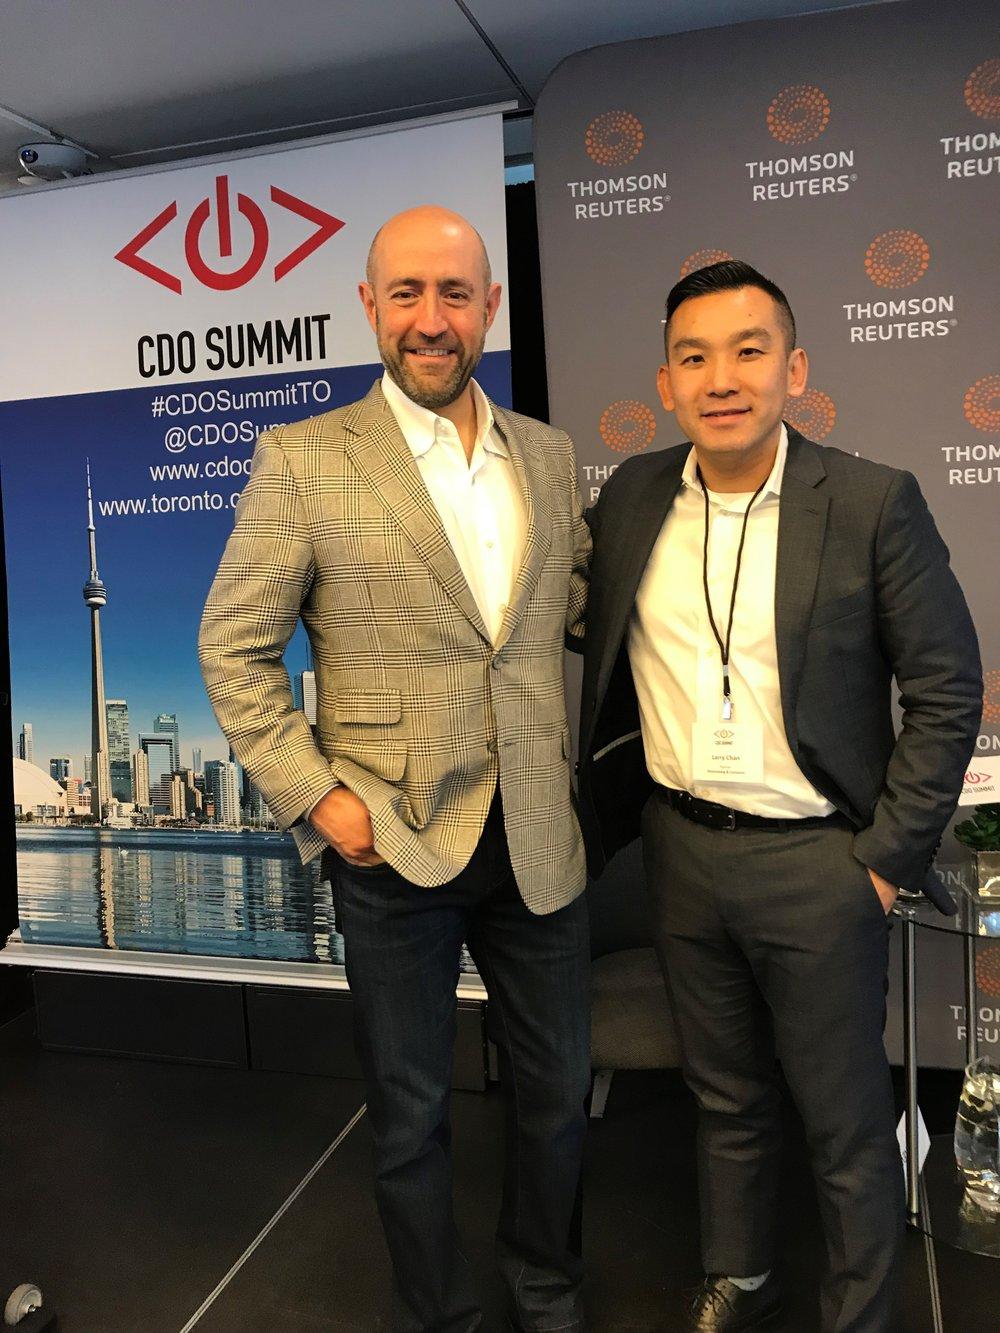 20171025 Jay Rosenzweig with Partner Larry Chan at Ground Breaking CDO Summit.jpg